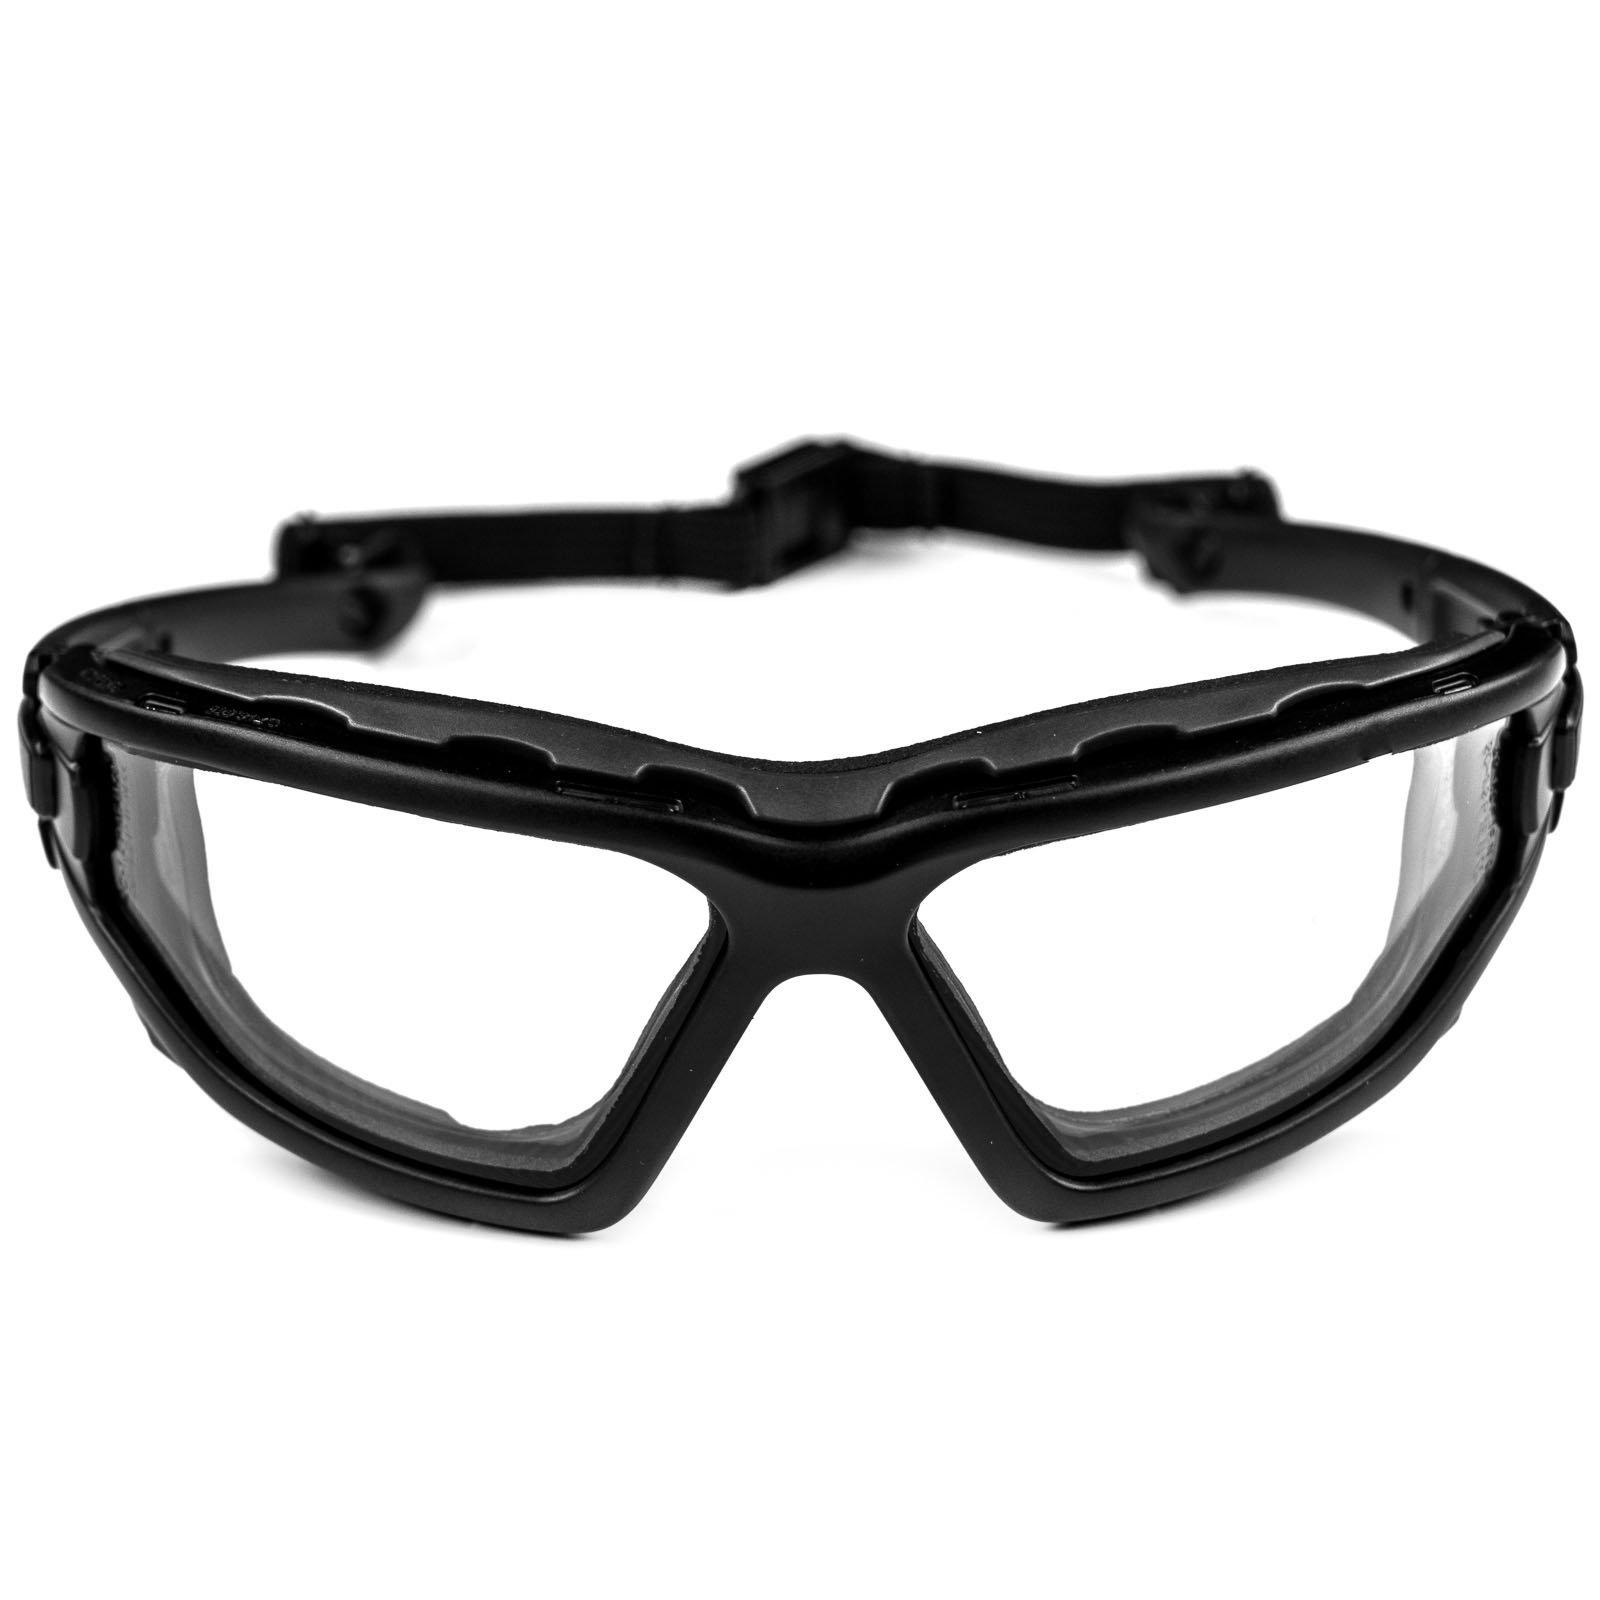 Novritsch Antifog Goggles - Low profile